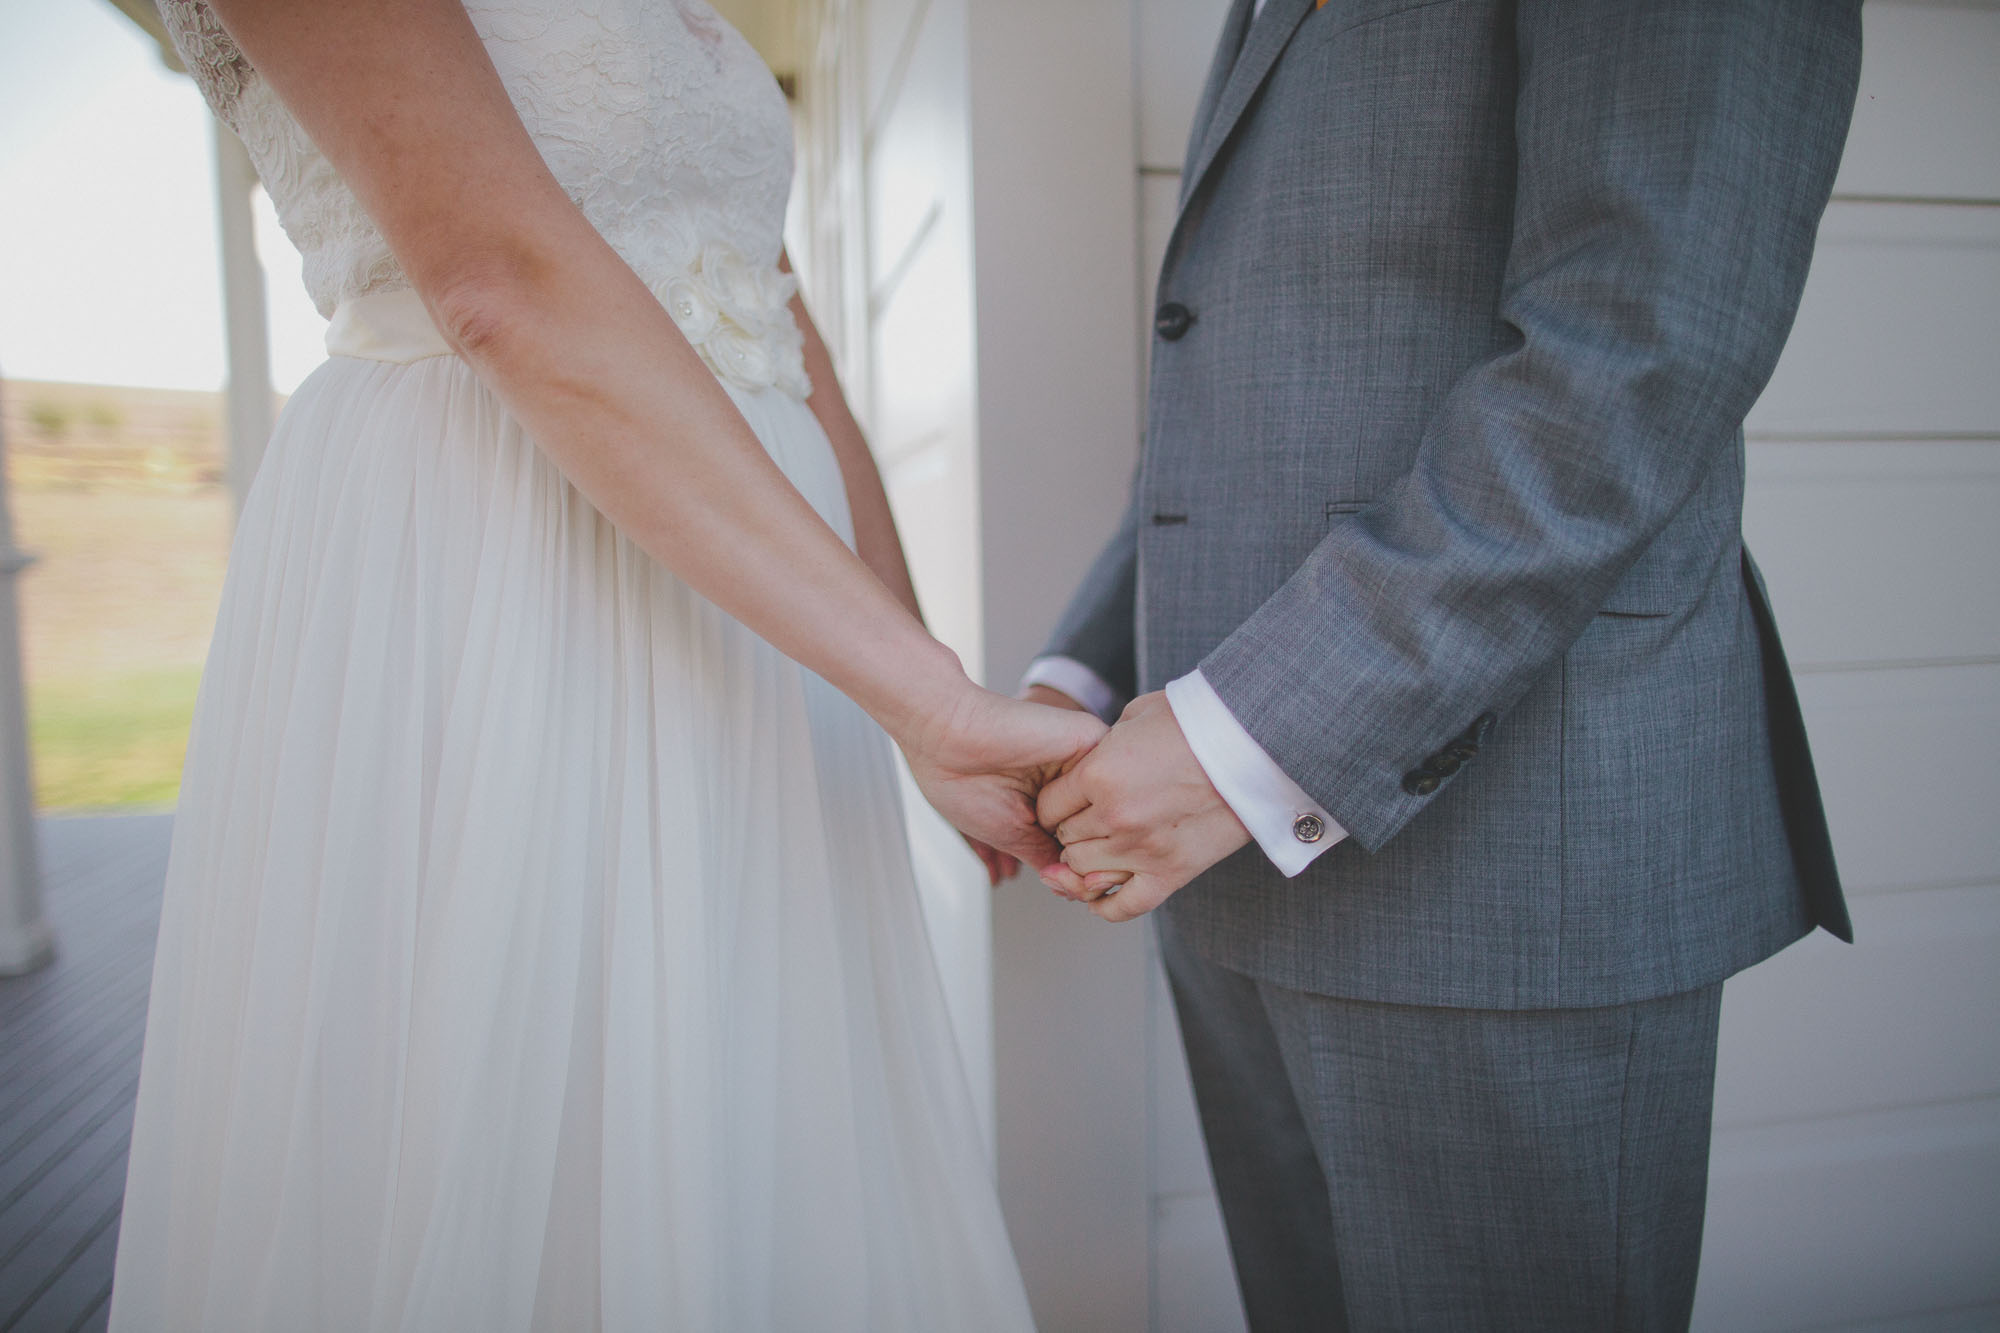 Gretchen_Gause_Petaluma_Olympias_Valley_Wedding_Photo-093.jpg